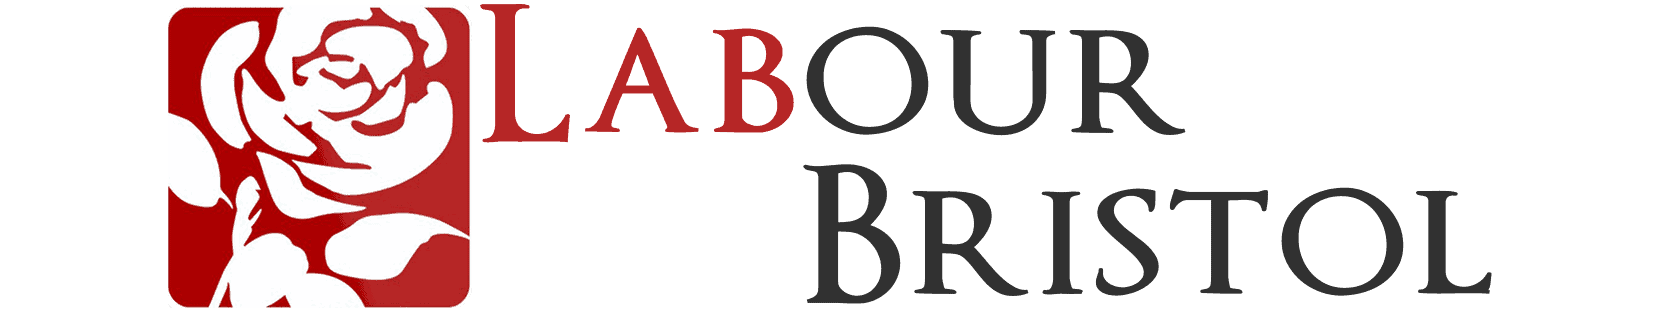 Labour Bristol